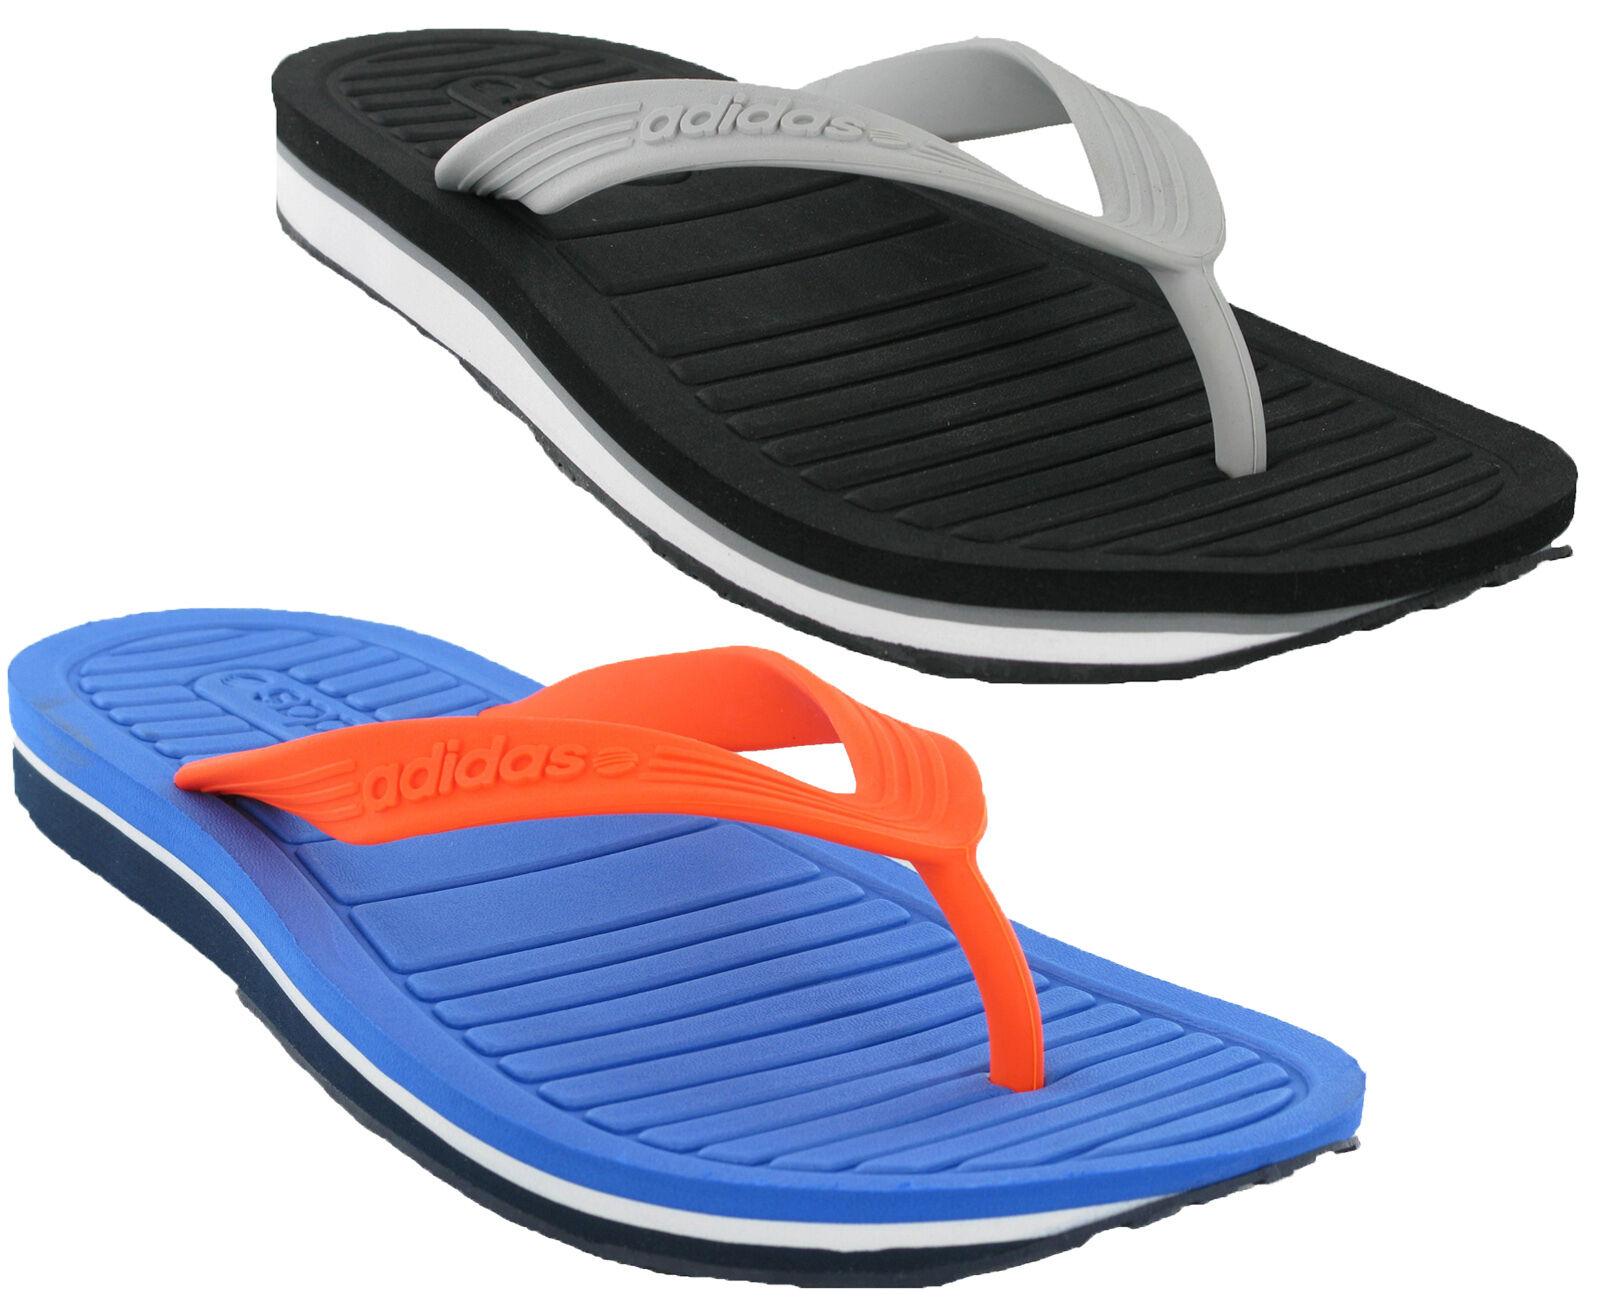 Adidas V Flip Flop Mens Thong Sandals Toepost Slide Pool Summer Beach Holiday